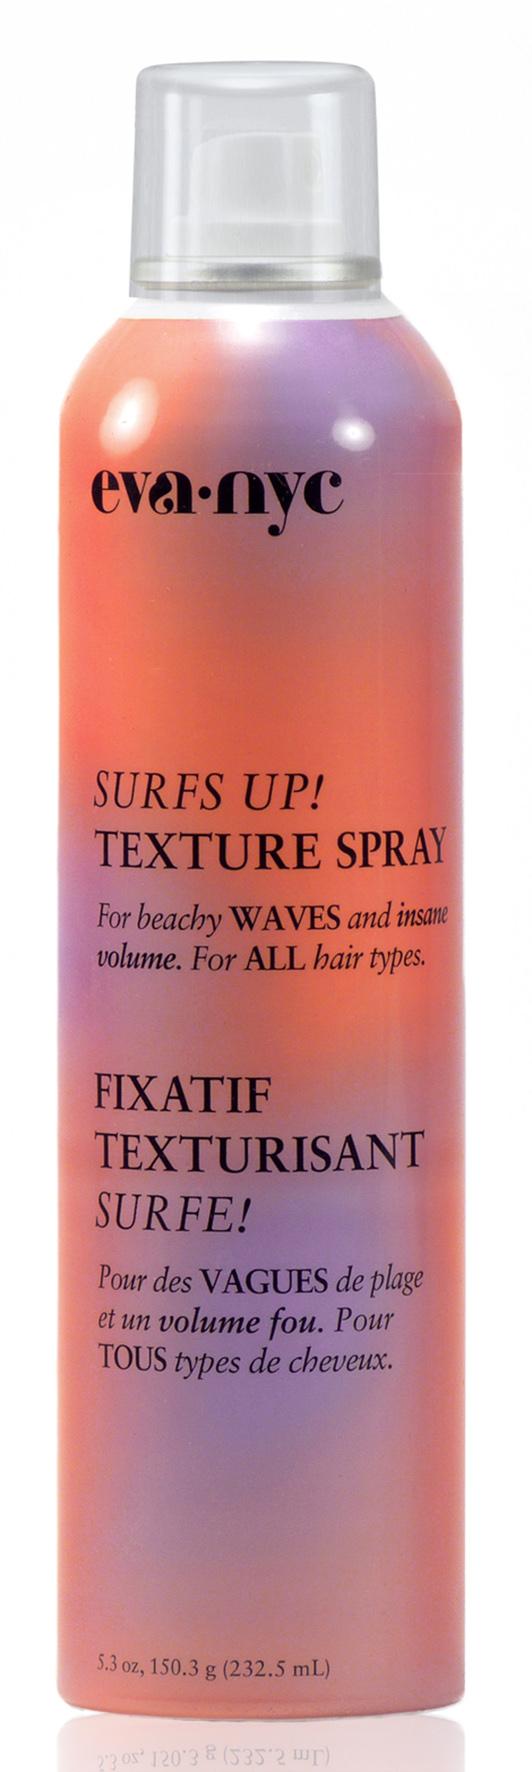 Surf's Up! Texture Spray - 232,5 ml